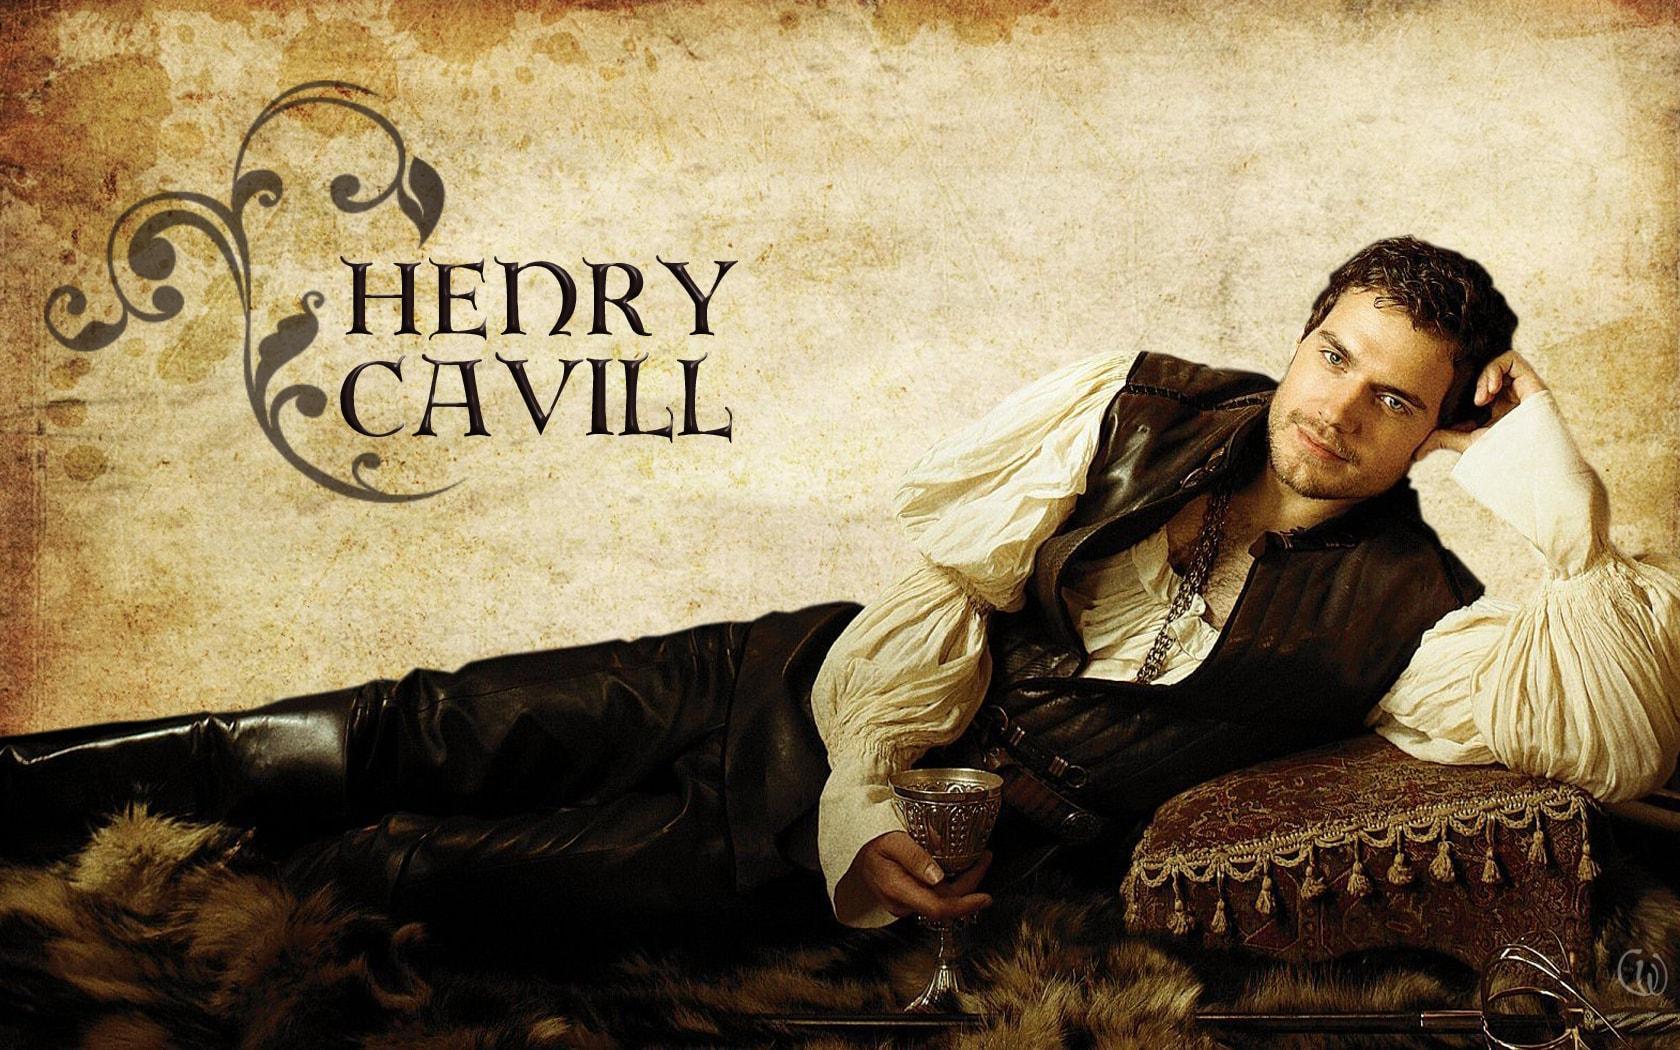 Henry Cavill HD Desktop Wallpapers | 7wallpapers.net